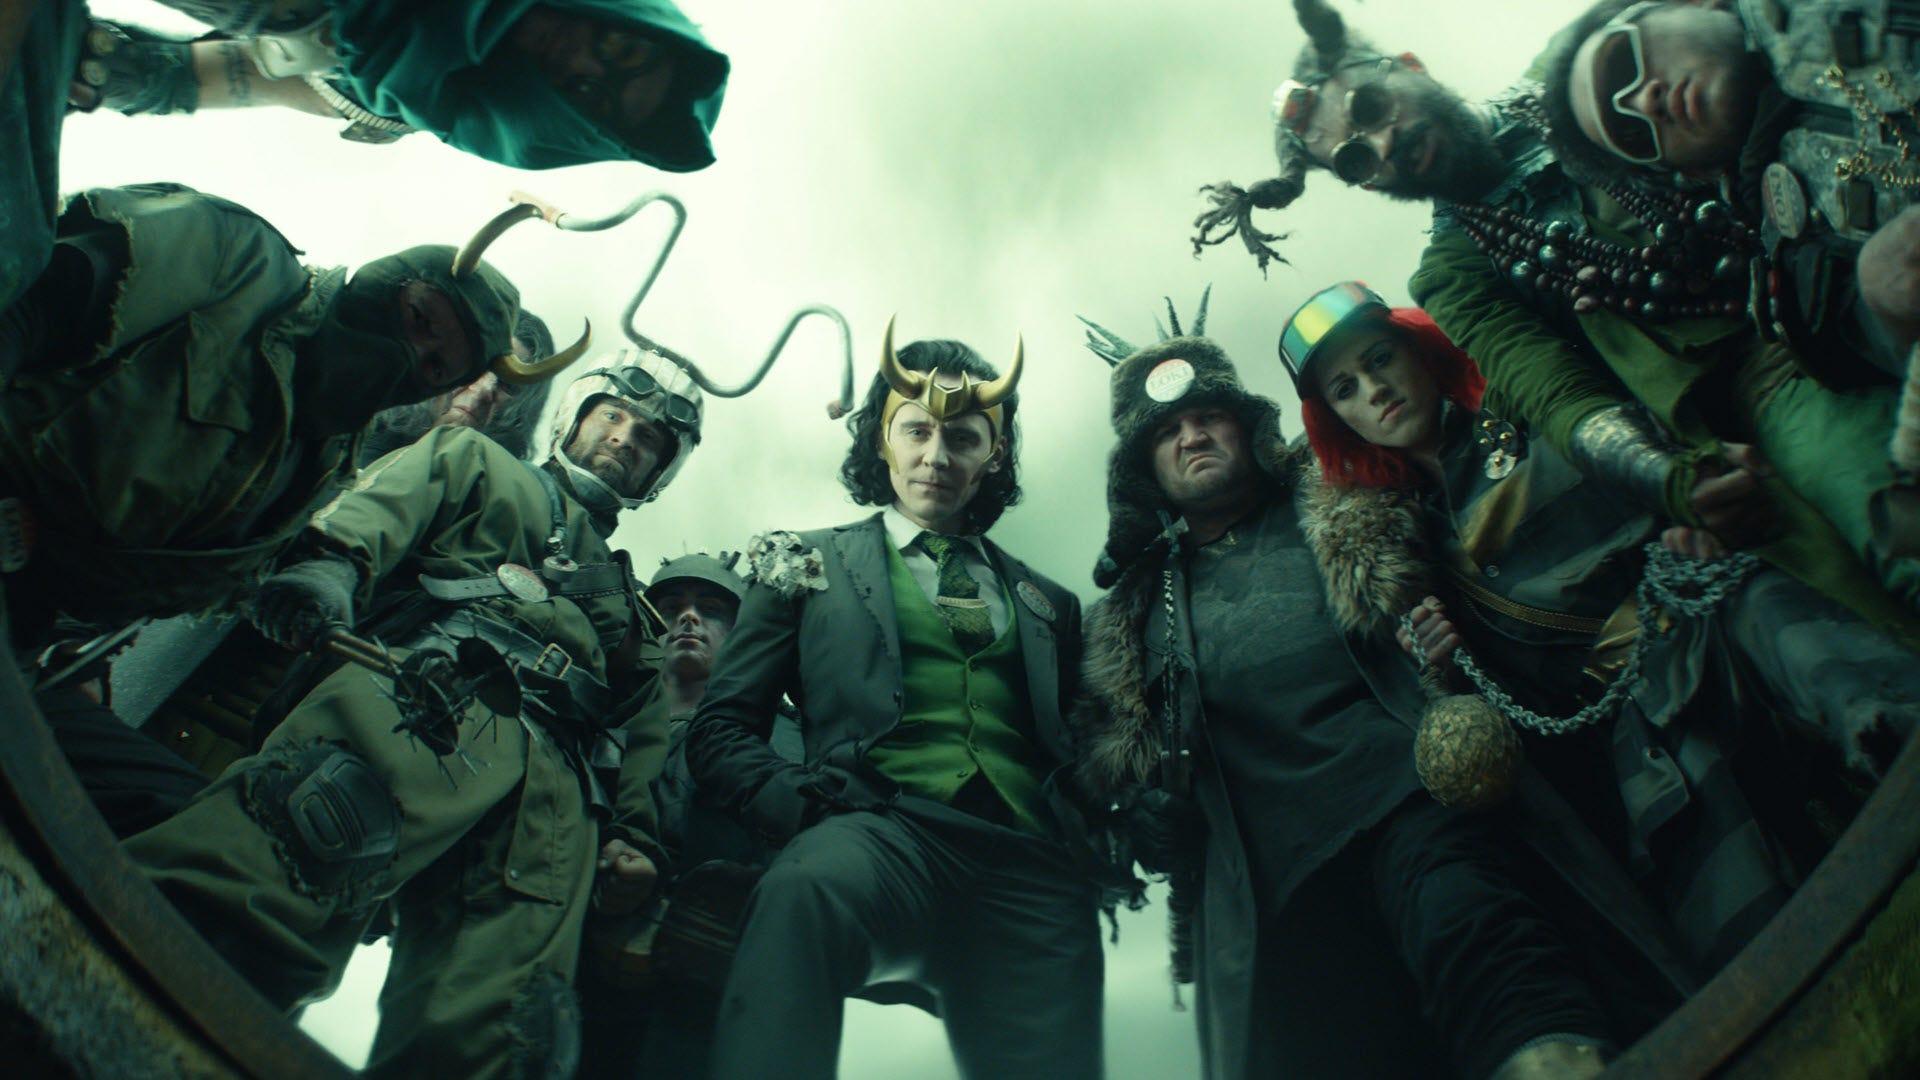 Many Lokis standing over a manhole.